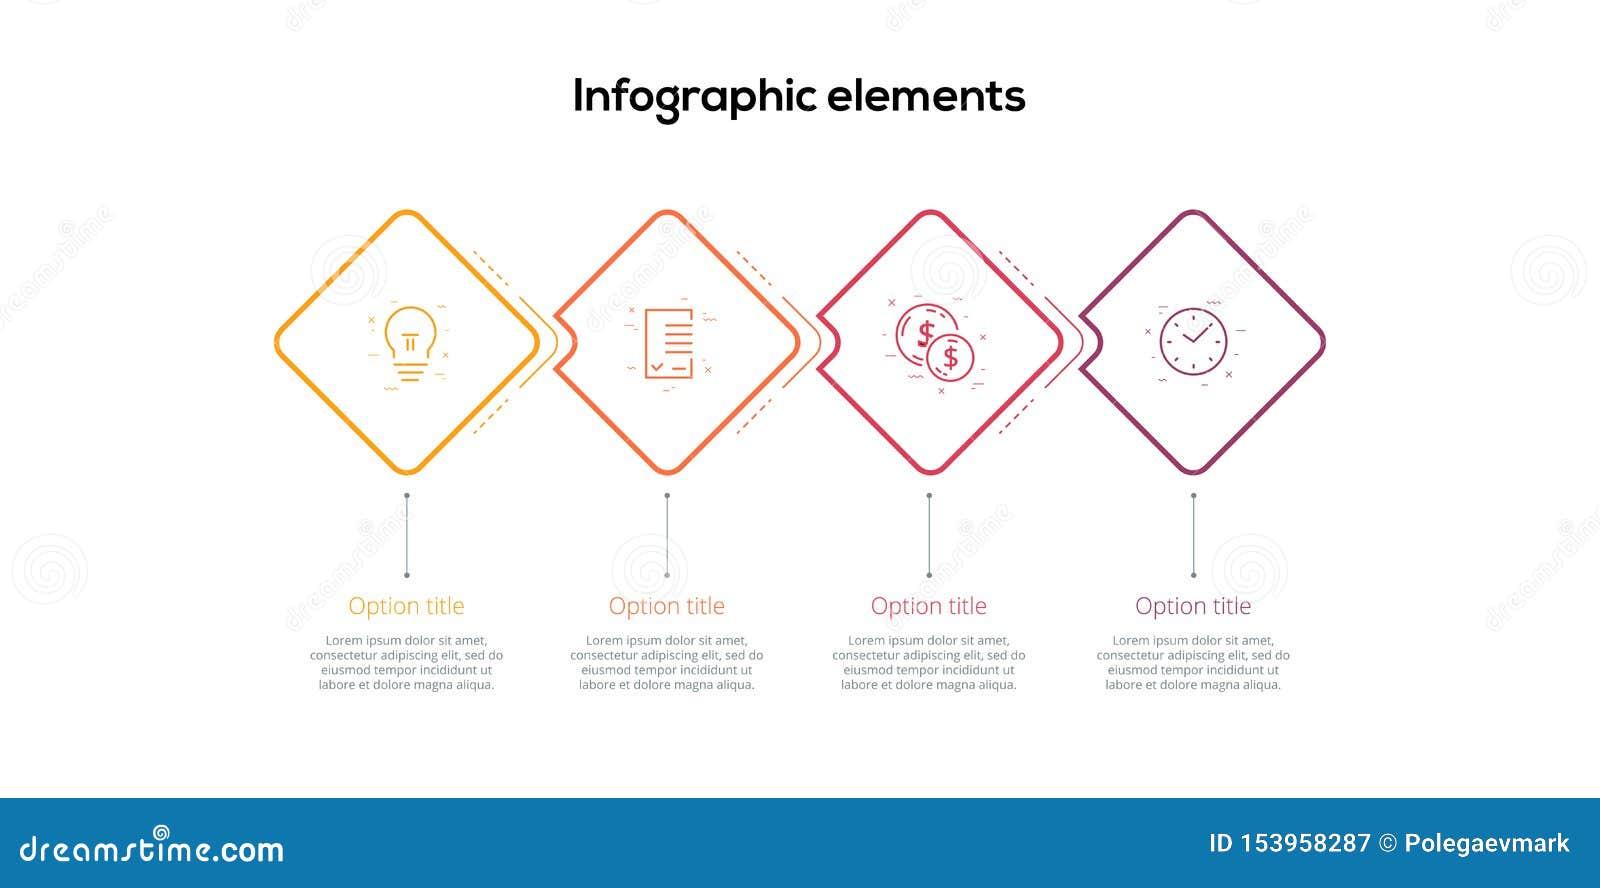 Infographics διαγραμμάτων επιχειρησιακής διαδικασίας με το βήμα 4 rhombs Τετραγωνικά εταιρικά γραφικά στοιχεία ροής της δουλειάς